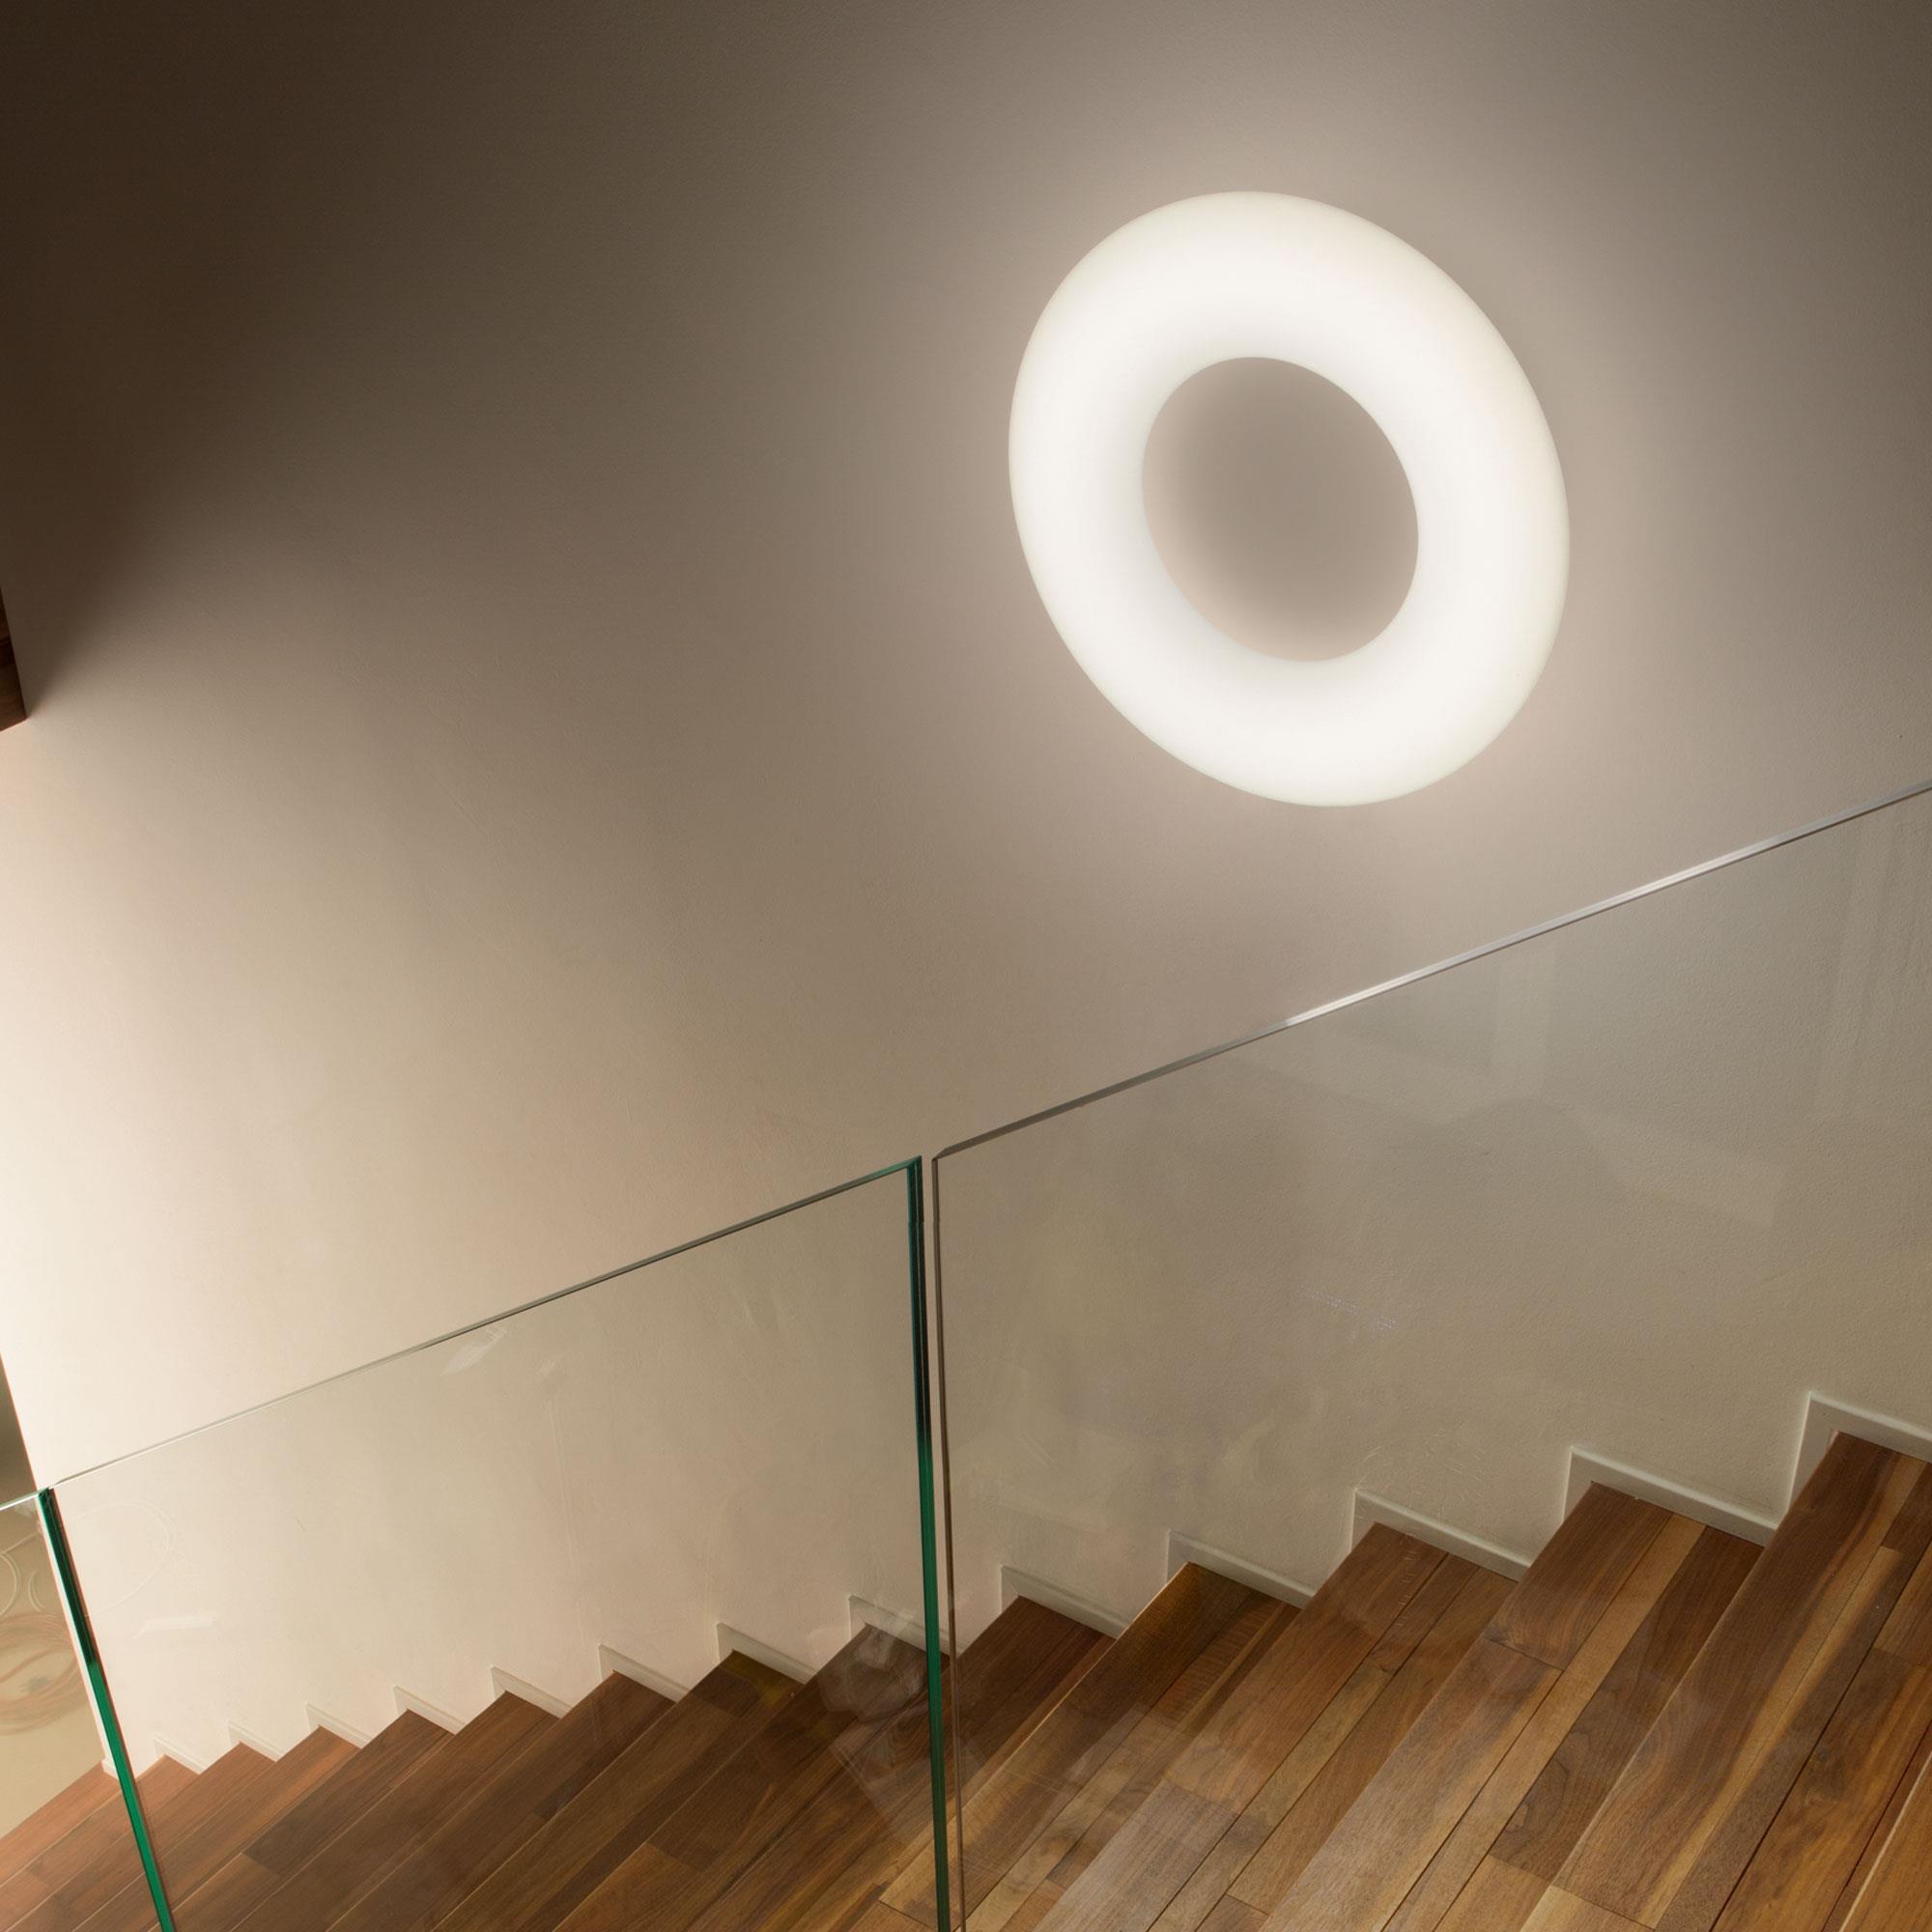 Ideal Lux 140551 POLO PL220 LED fali / mennyezeti lámpa